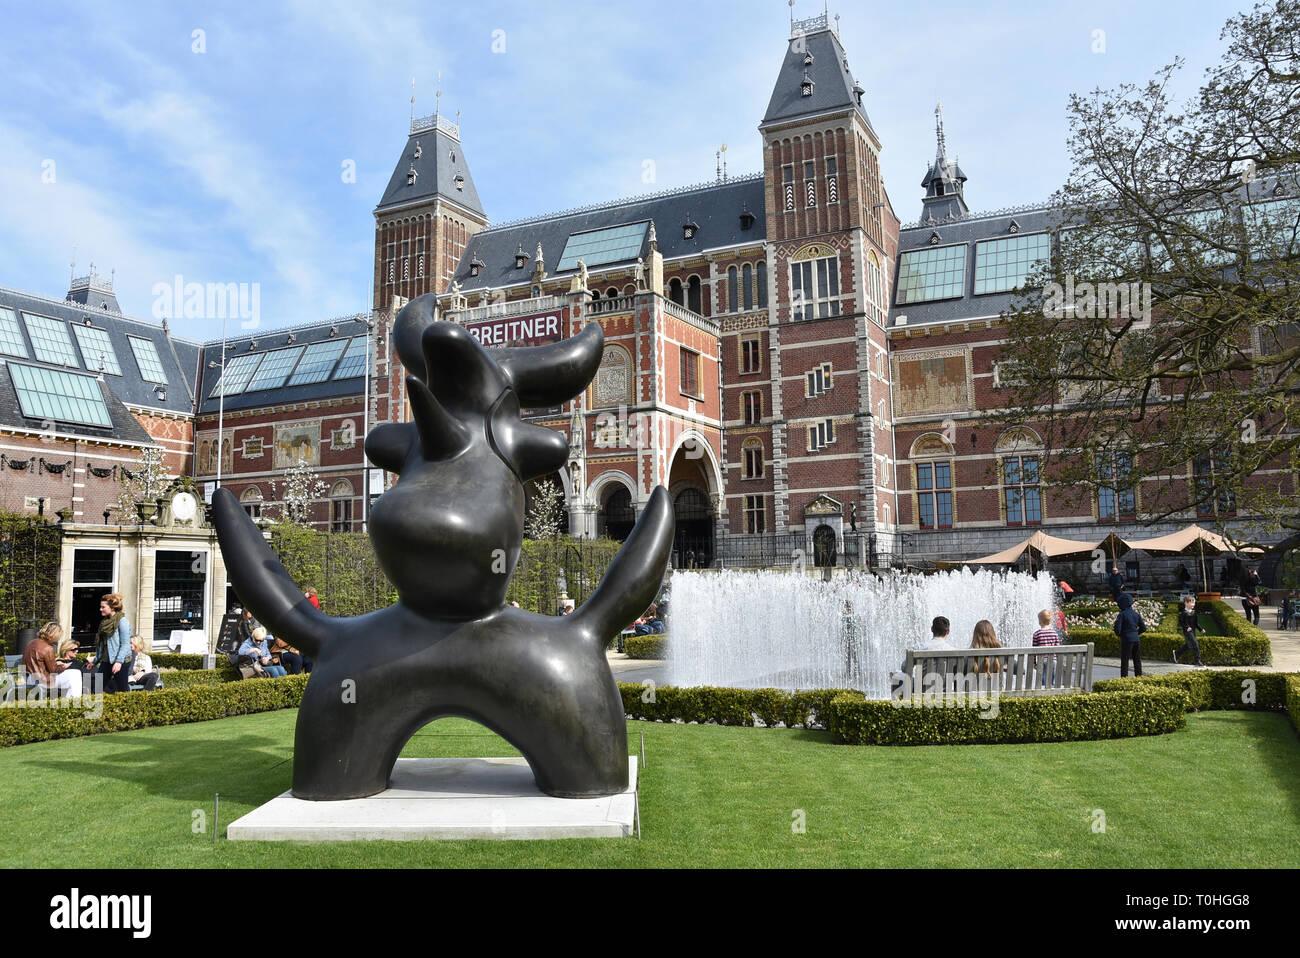 Oiseau Lunaire bronce 1893-1983 1966-1983 Joan Miró Rijksmuseum ( ) Museumplein Amsterdam Holanda Museo Holandés Imagen De Stock